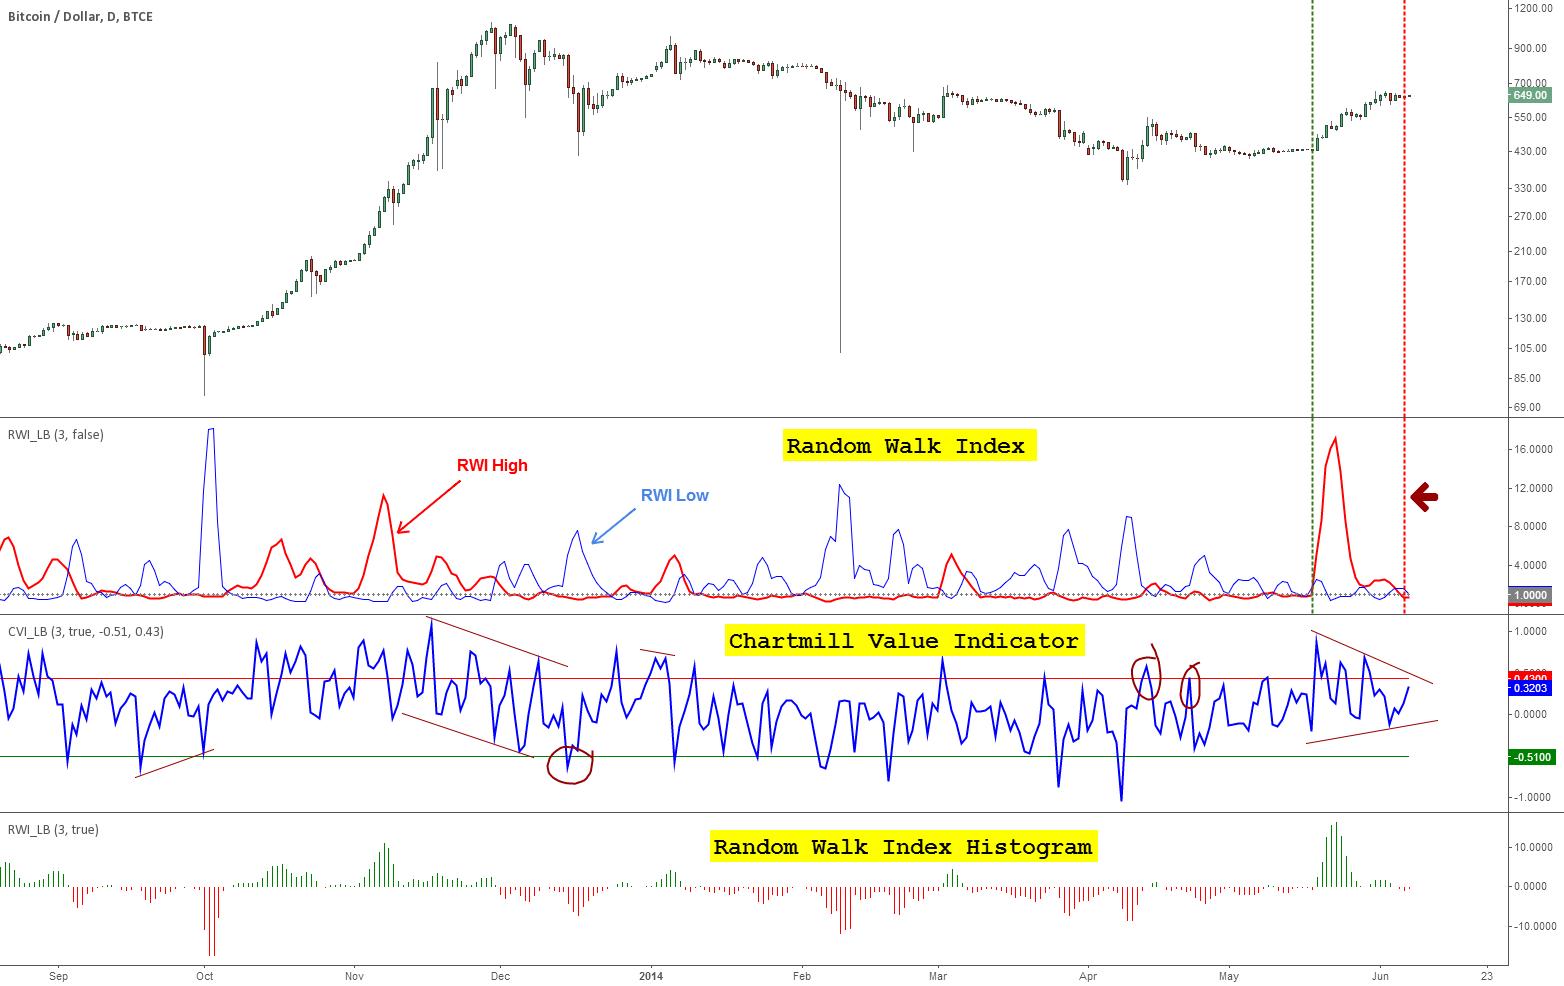 Indicators: Chartmill Value Indicator & Random Walk Index